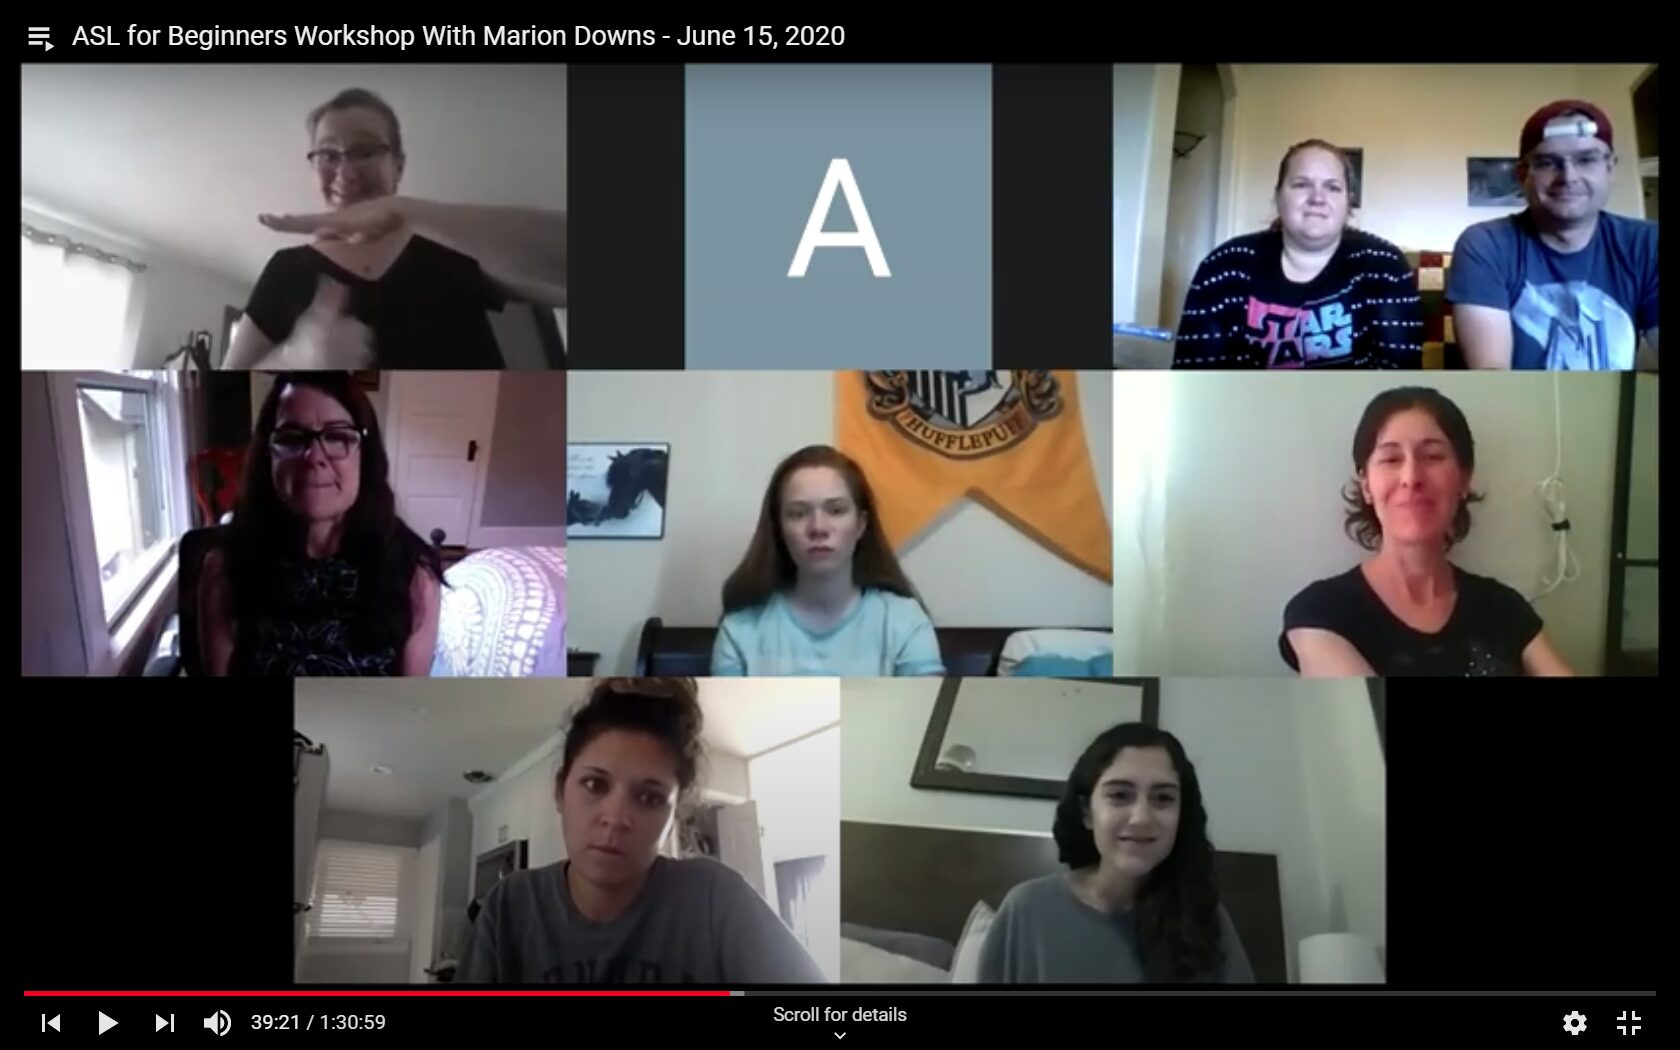 screenshot of a group video call